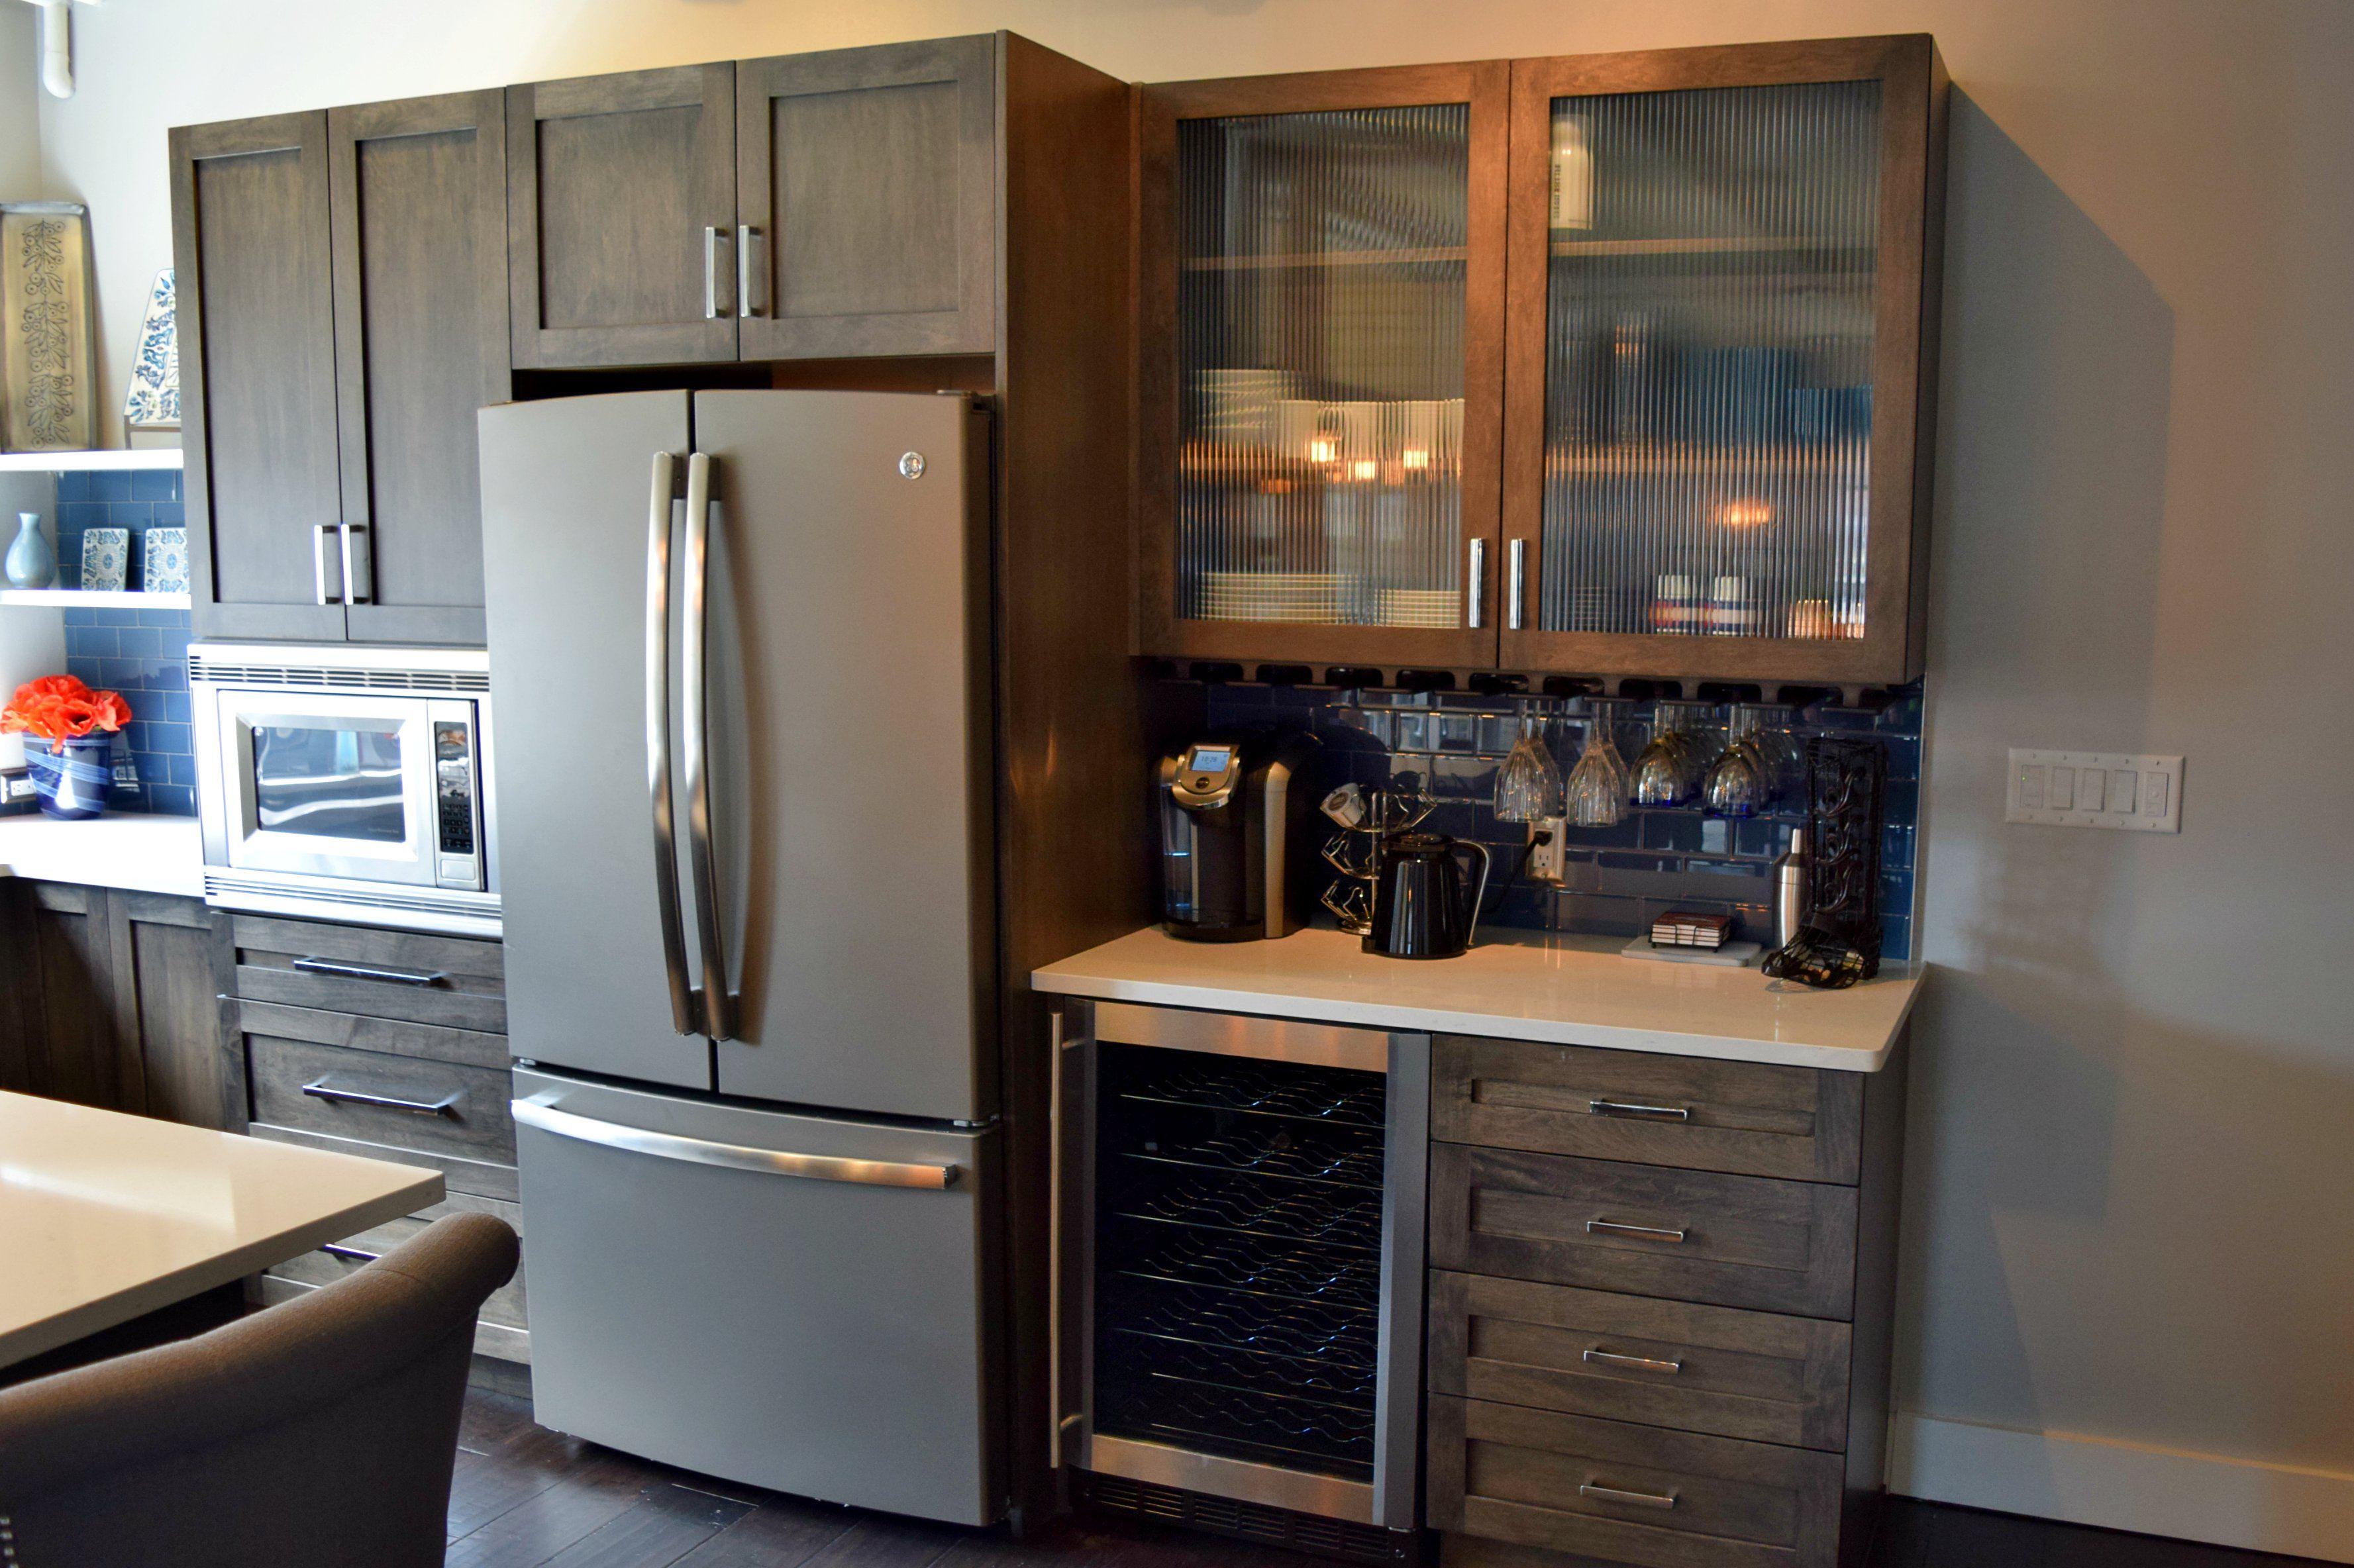 BKC Kitchen And Bath   Crystal Cabinets, Regent Door Style, Blackstone  Finish On Maple